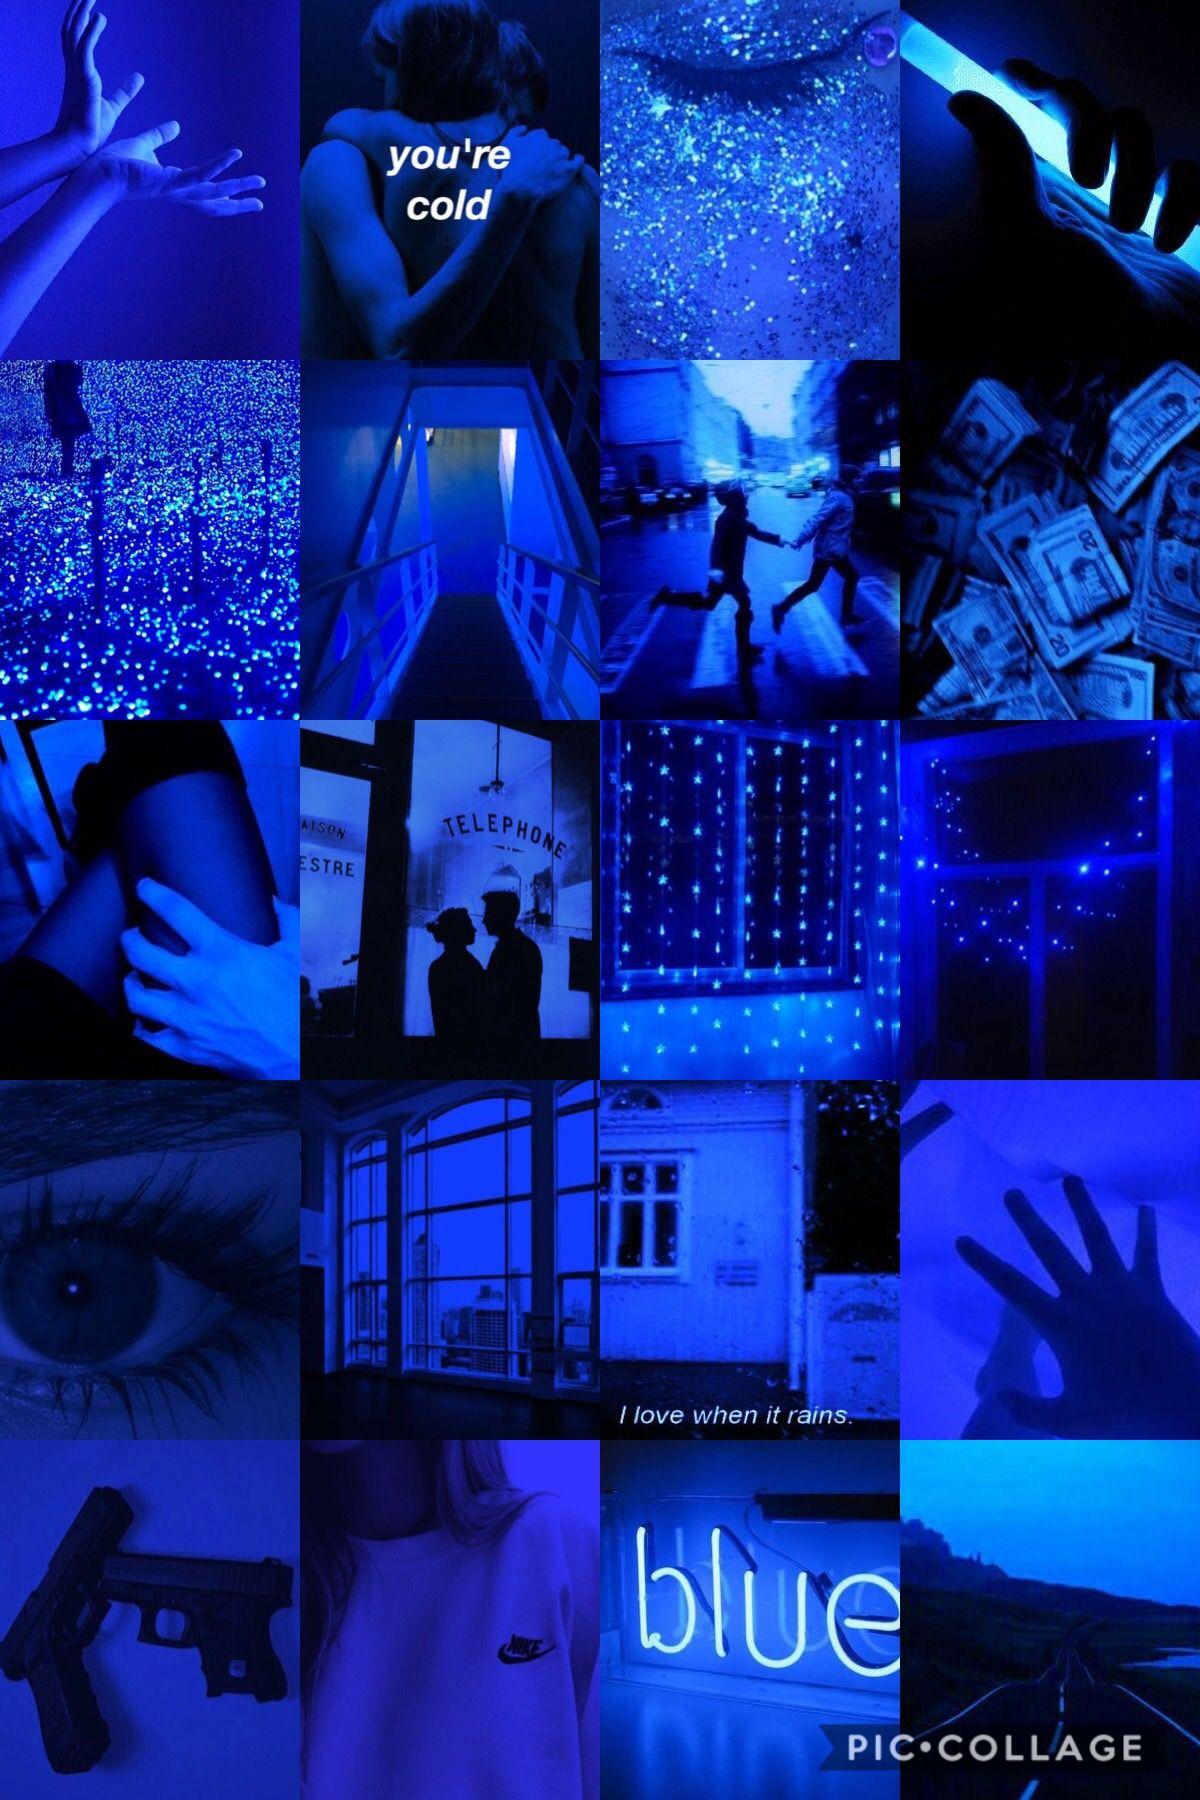 Dark Blue Aesthetic Blue aesthetic, Baby blue aesthetic